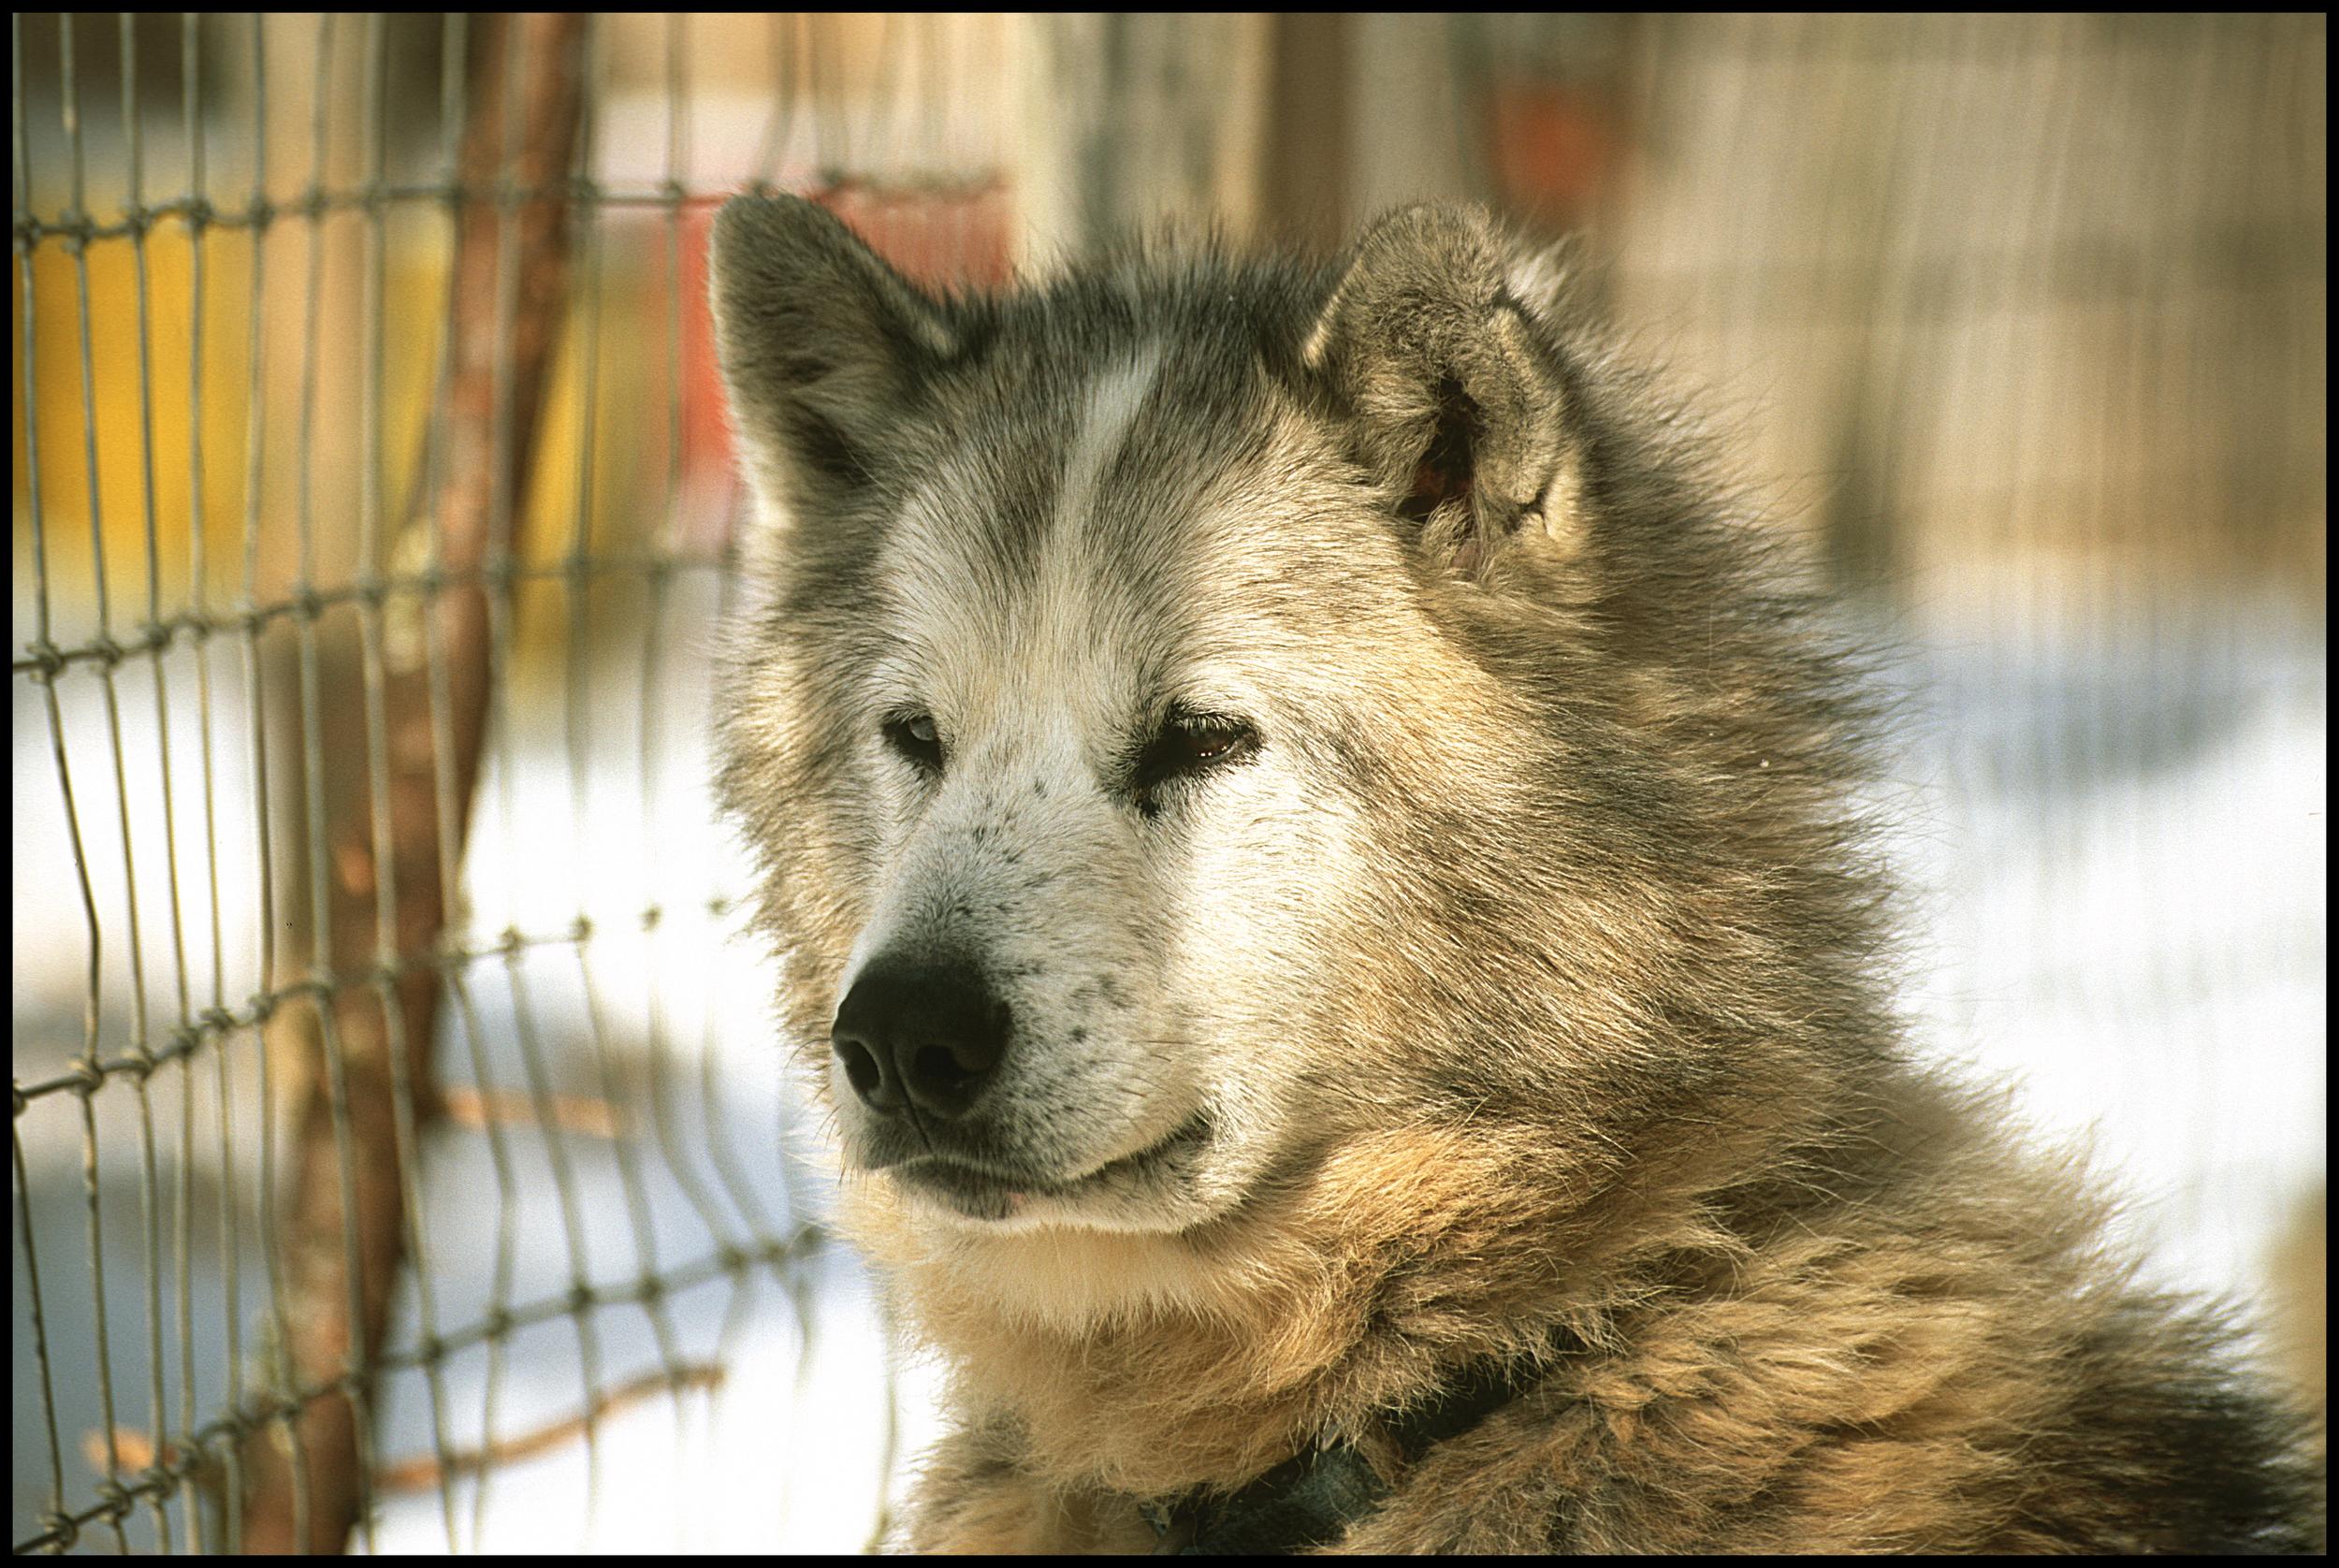 Grecia - Inuit Sled Dog, Ely, MN